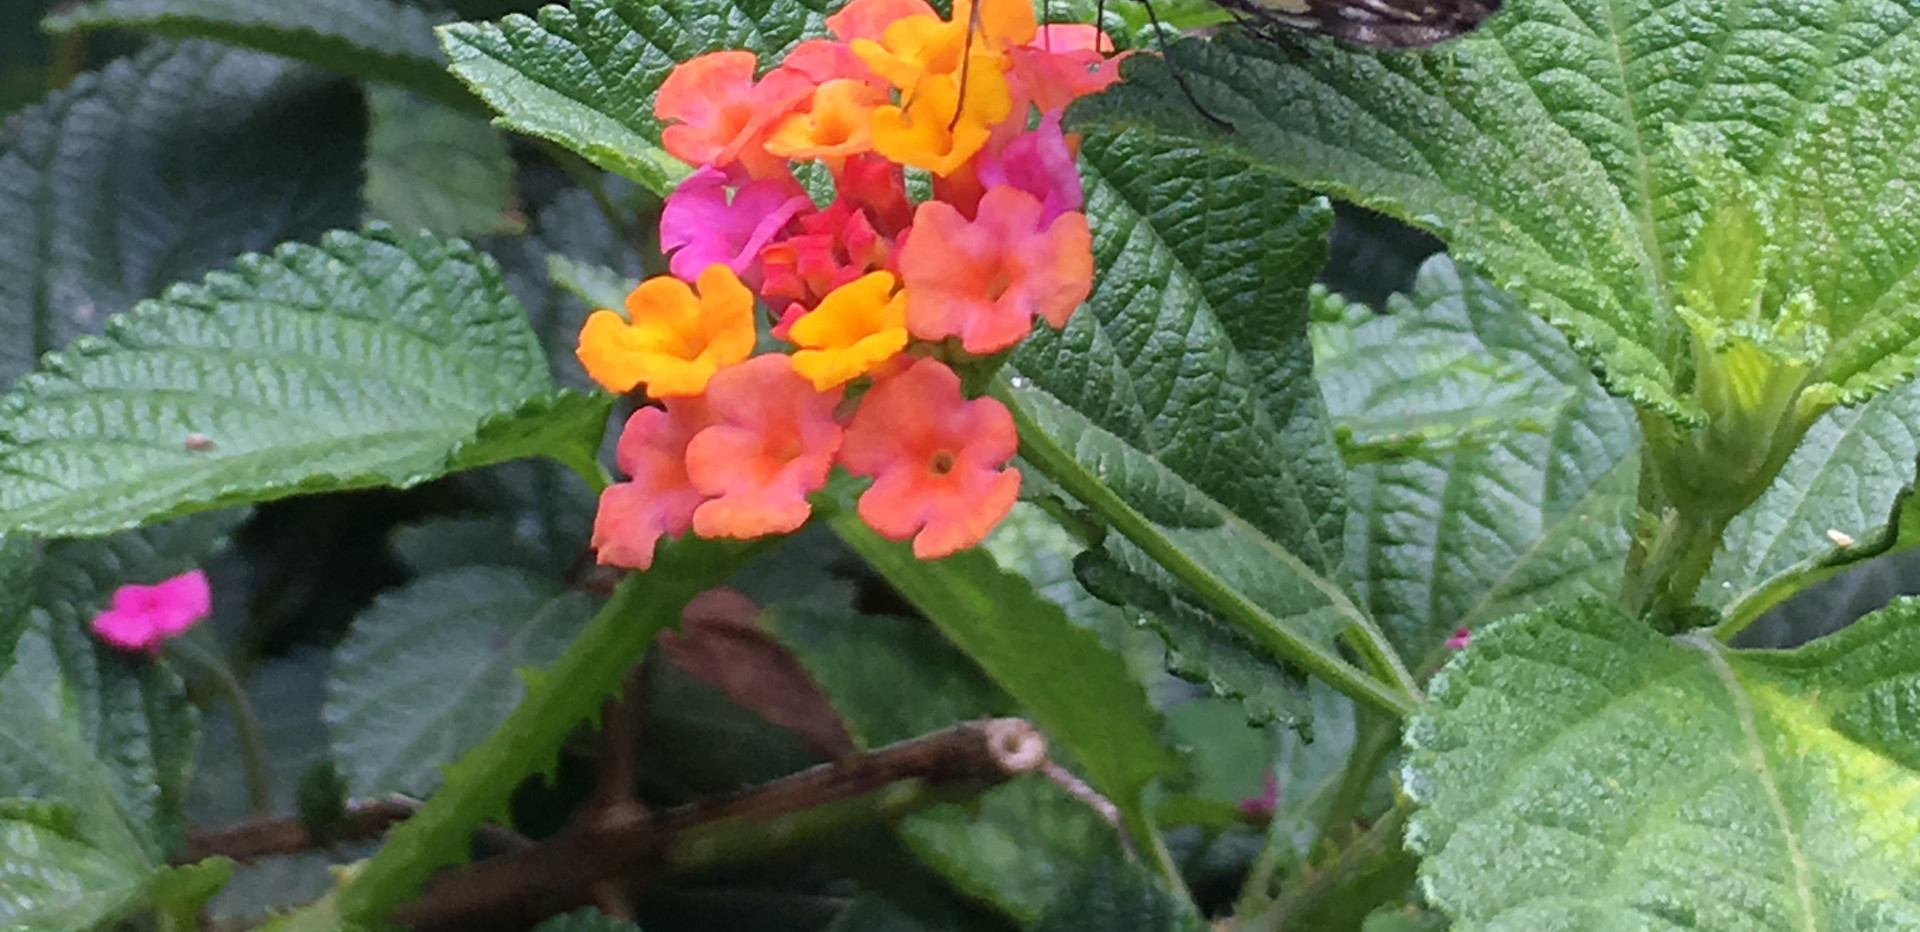 Flora and Mariposa